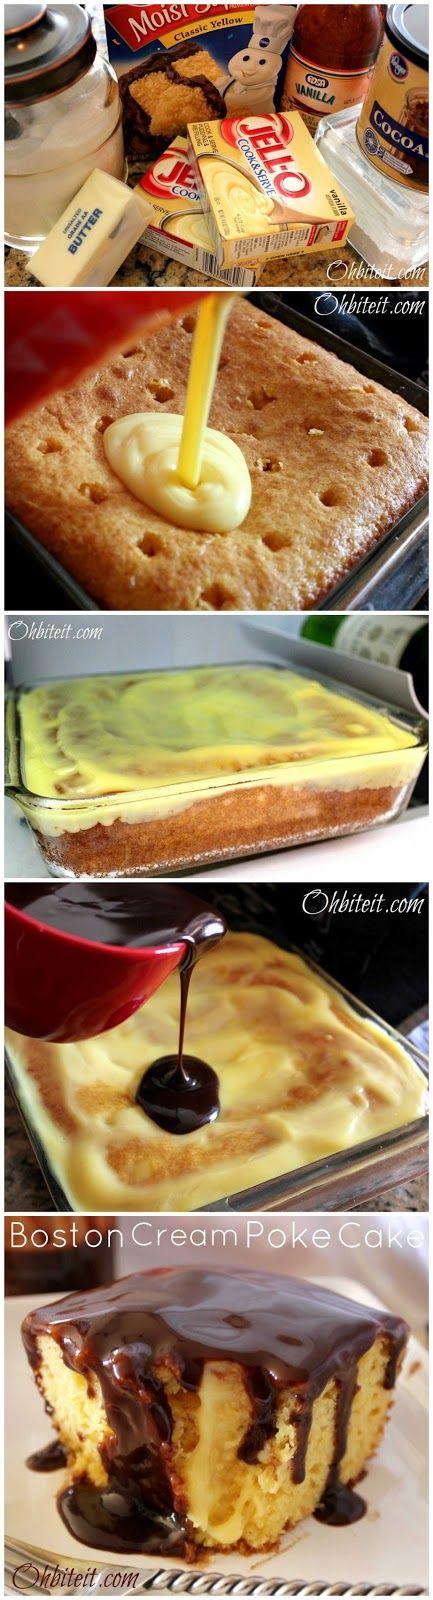 Boston Cream Poke Cake Recipe ~ Crazy Good!